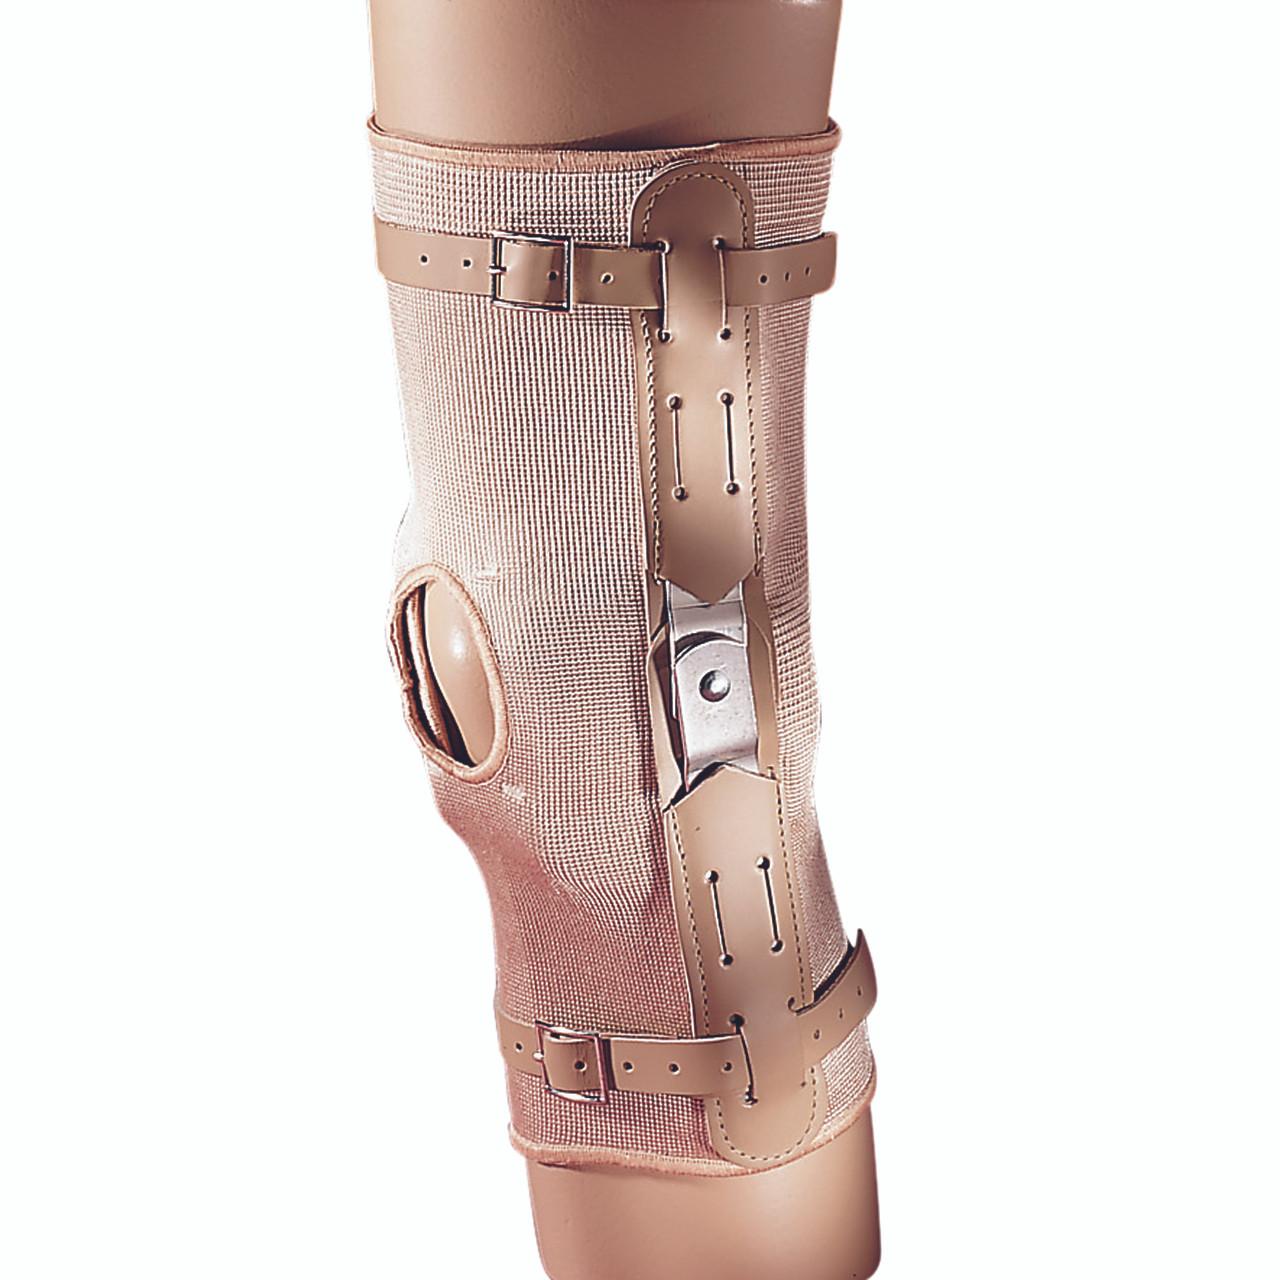 70b30d12c8 Elastic Stabilization Hinged Knee Brace w/Open Patella - Freeman Mfg Co.